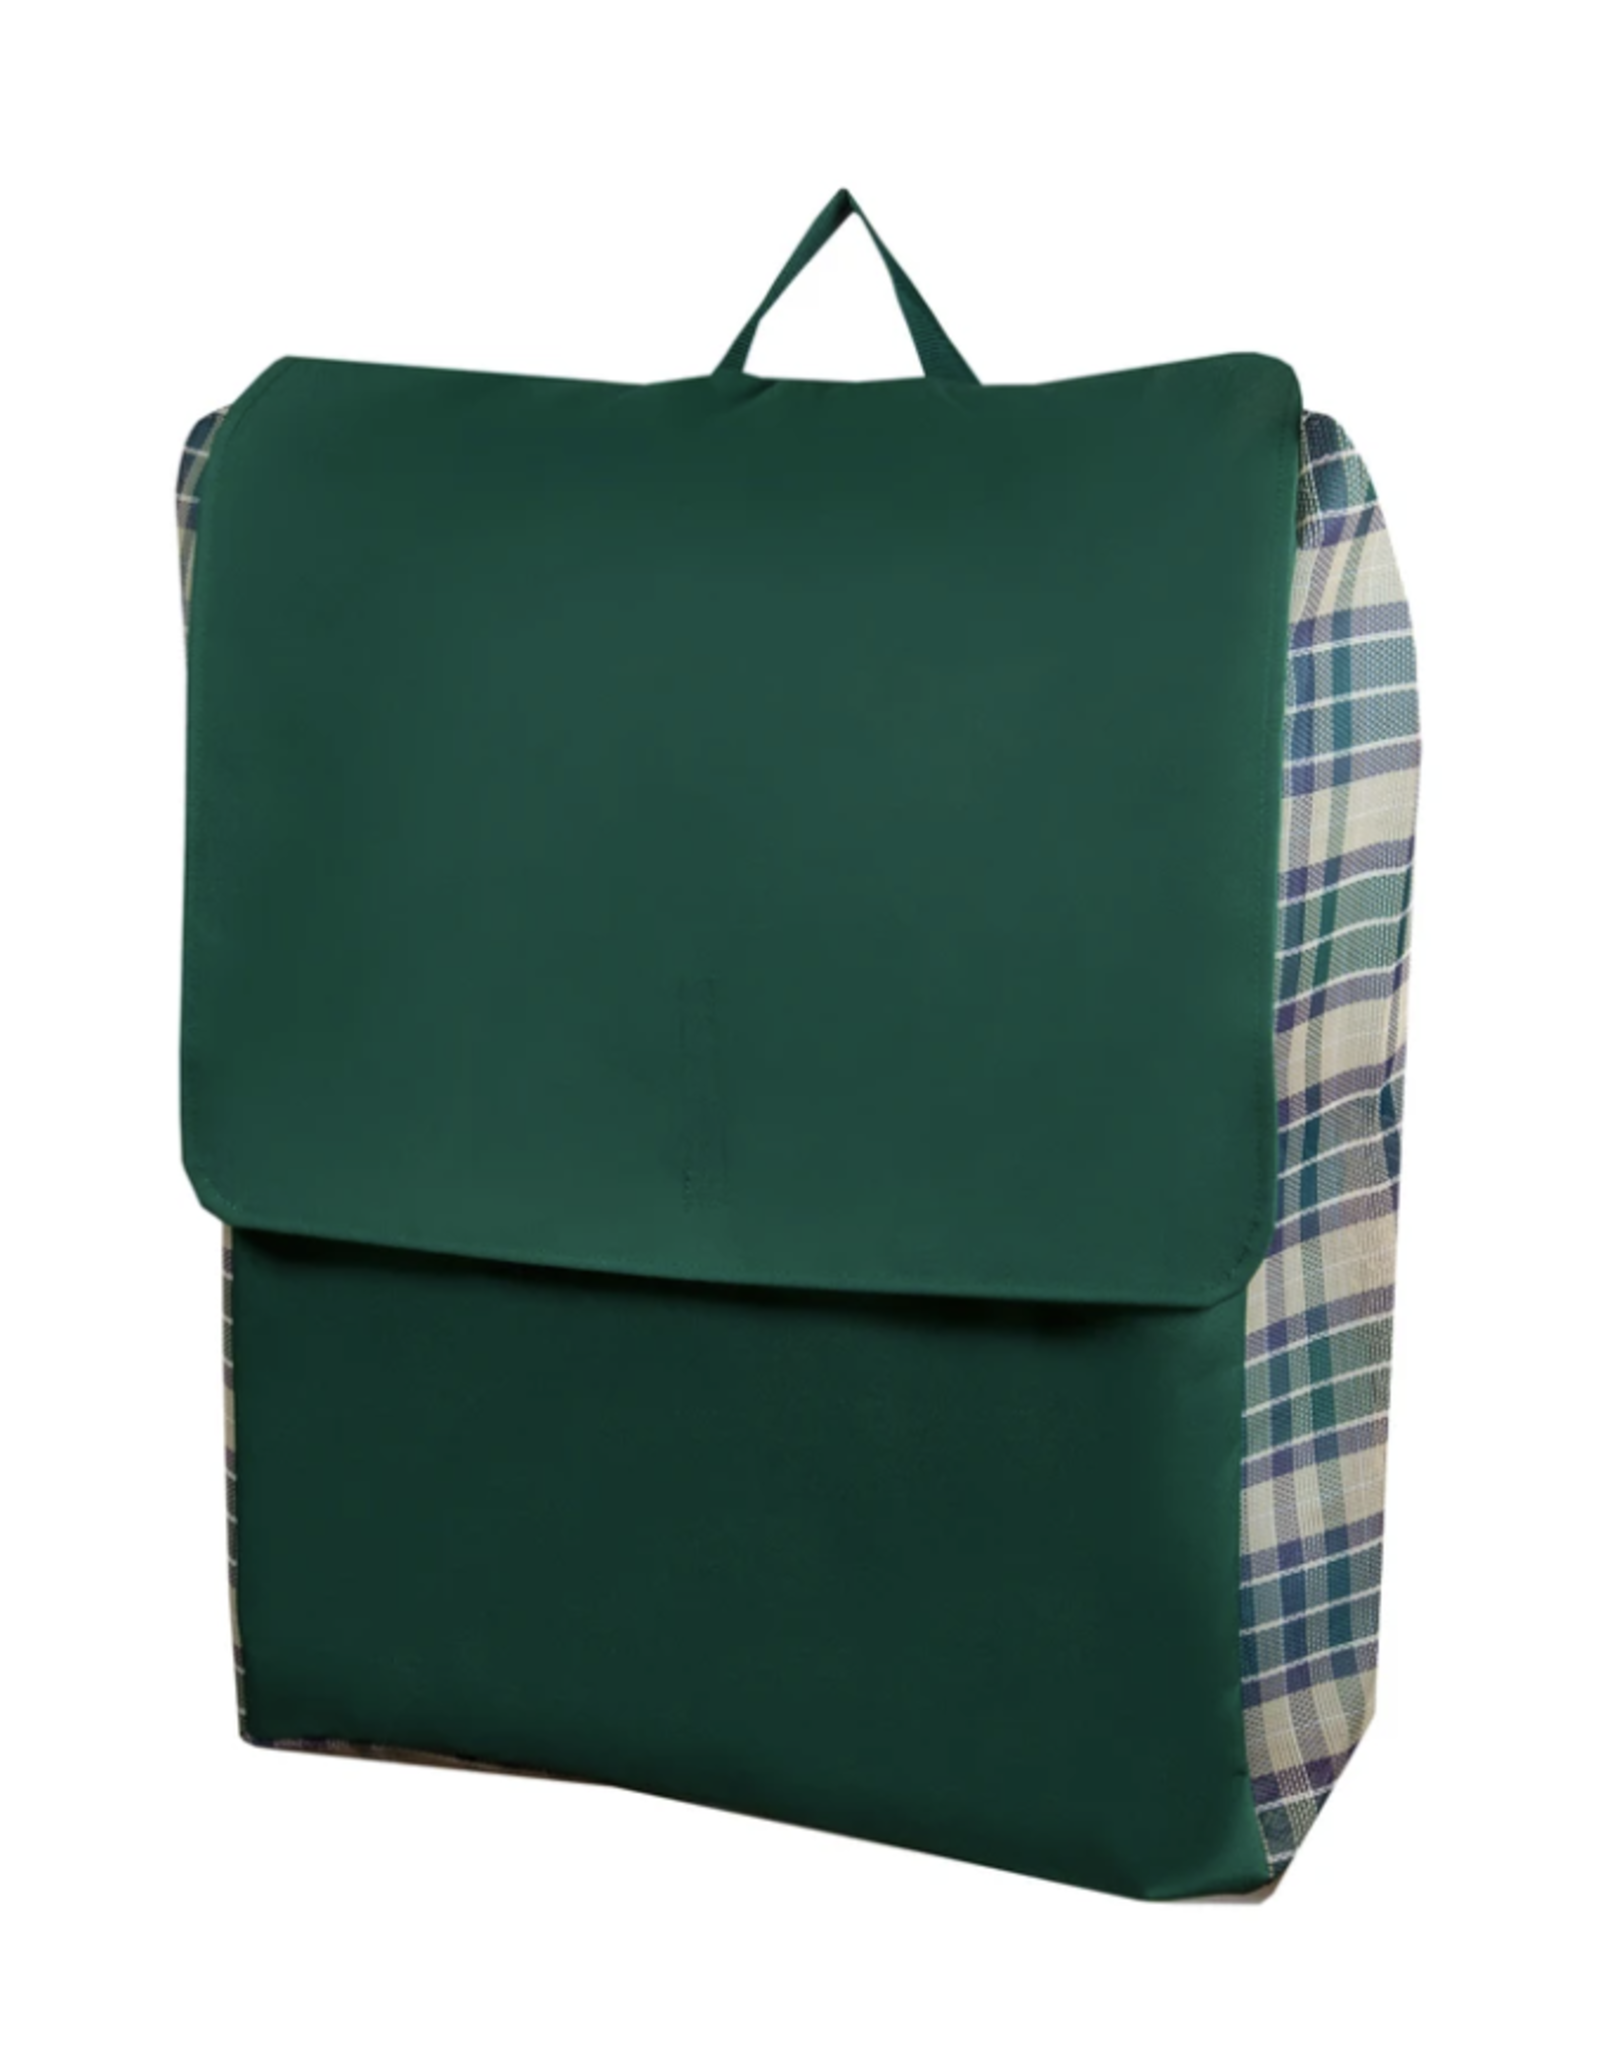 Kensington Blanket Storage Bag